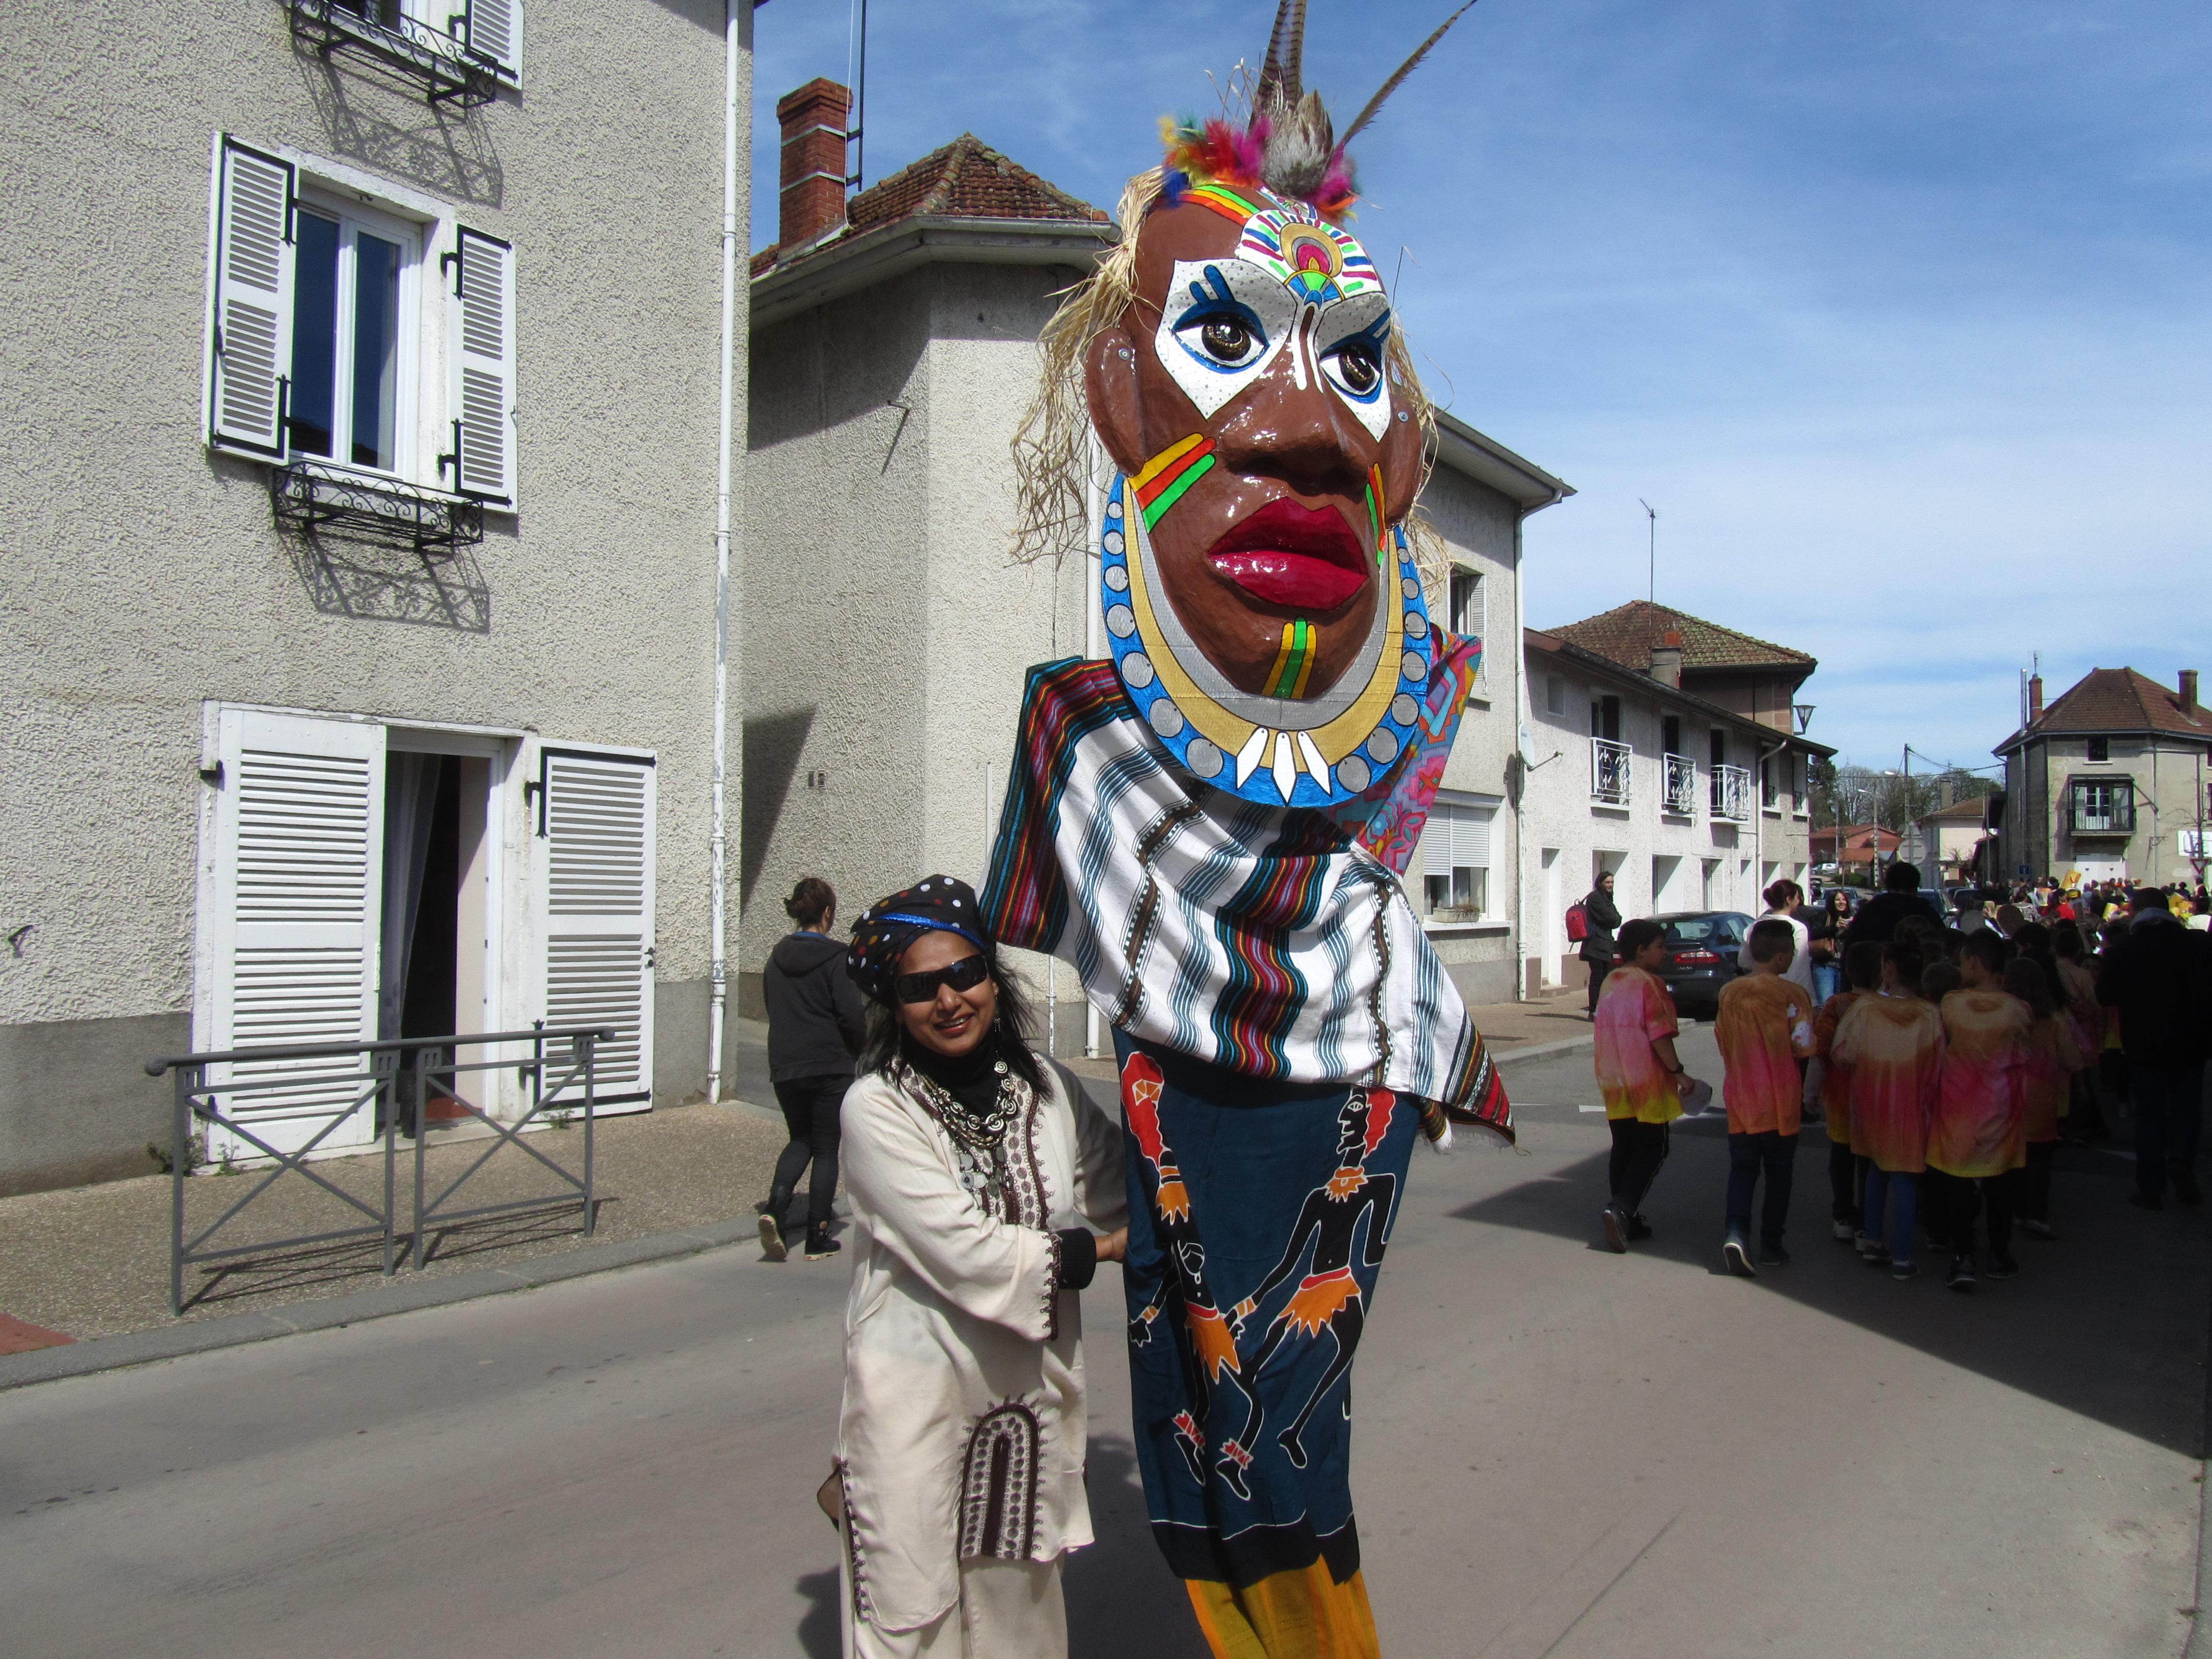 Carnavl 2015 le masque africain